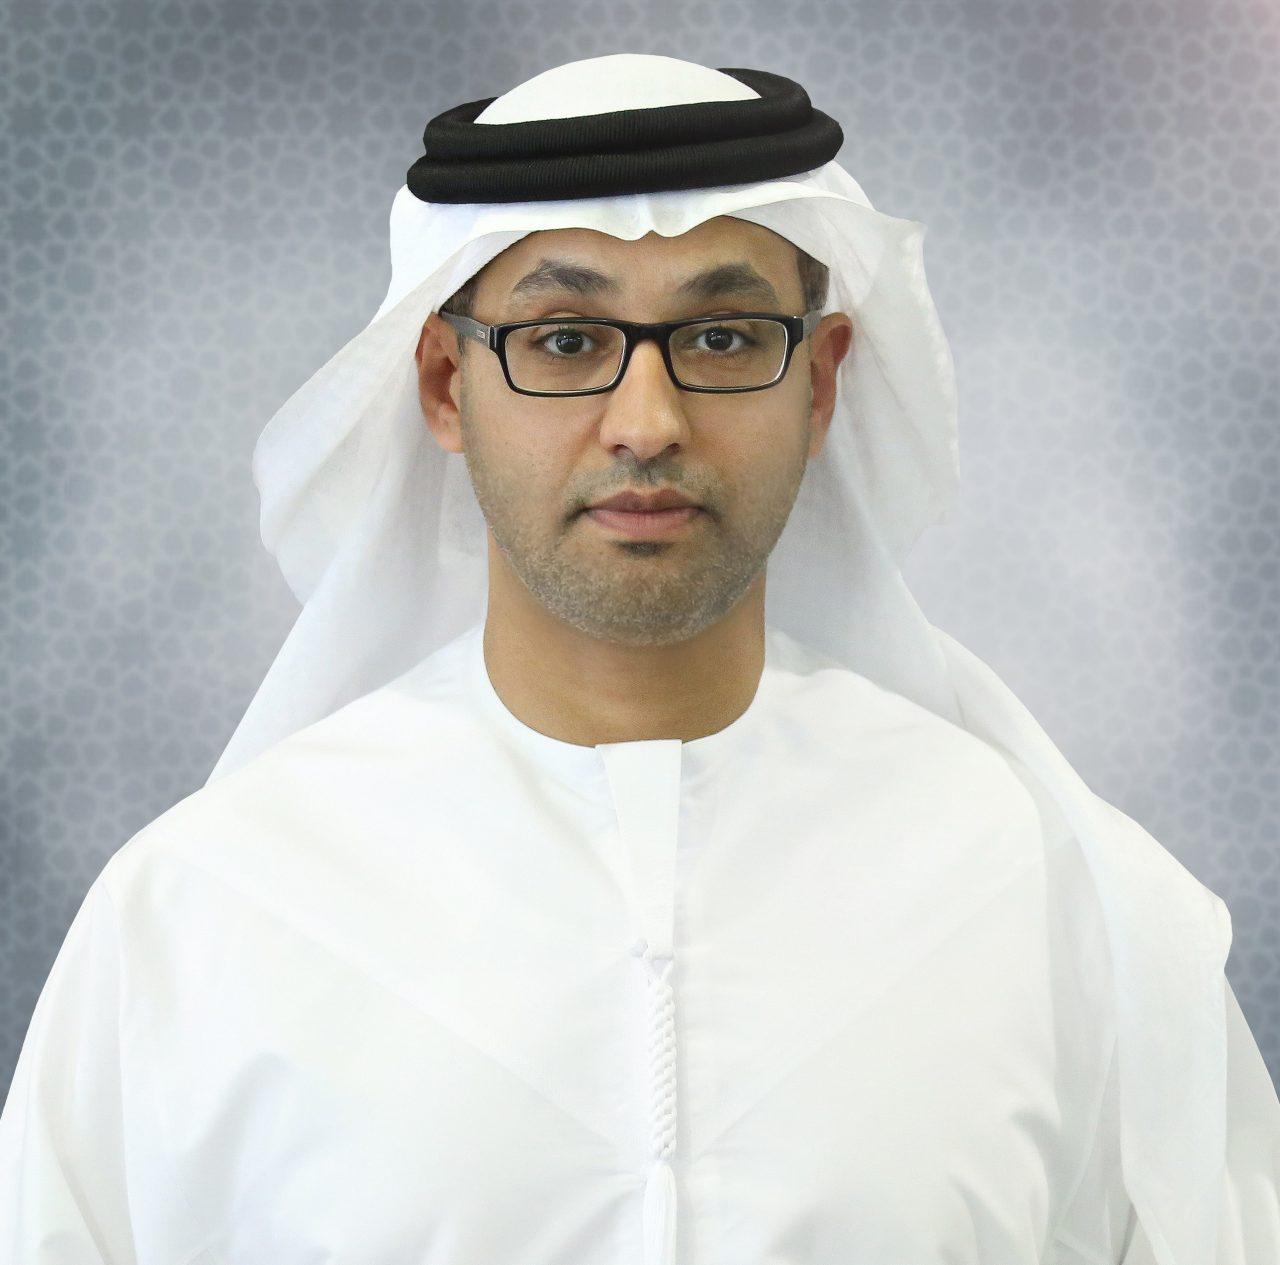 https://www.securetech.ae/wp-content/uploads/2019/05/Dr.Abdulla-Al-Neaimi-1280x1265.jpg